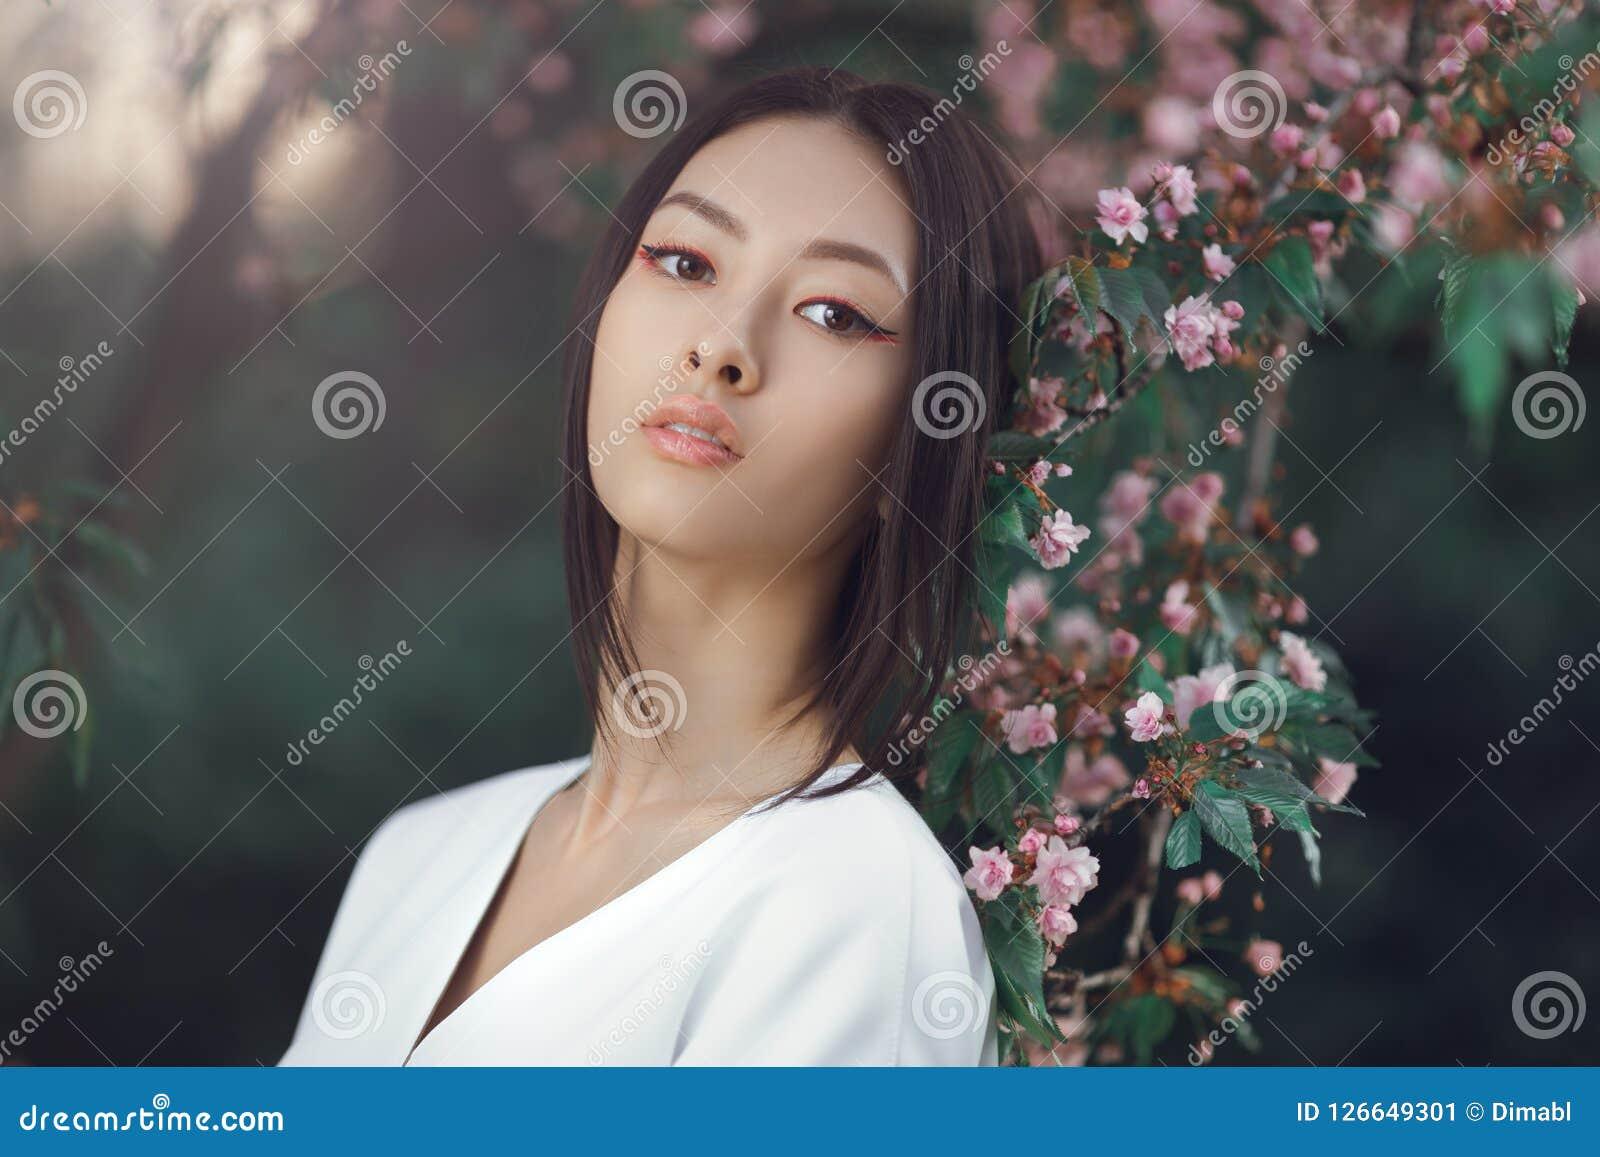 Japanese model close up